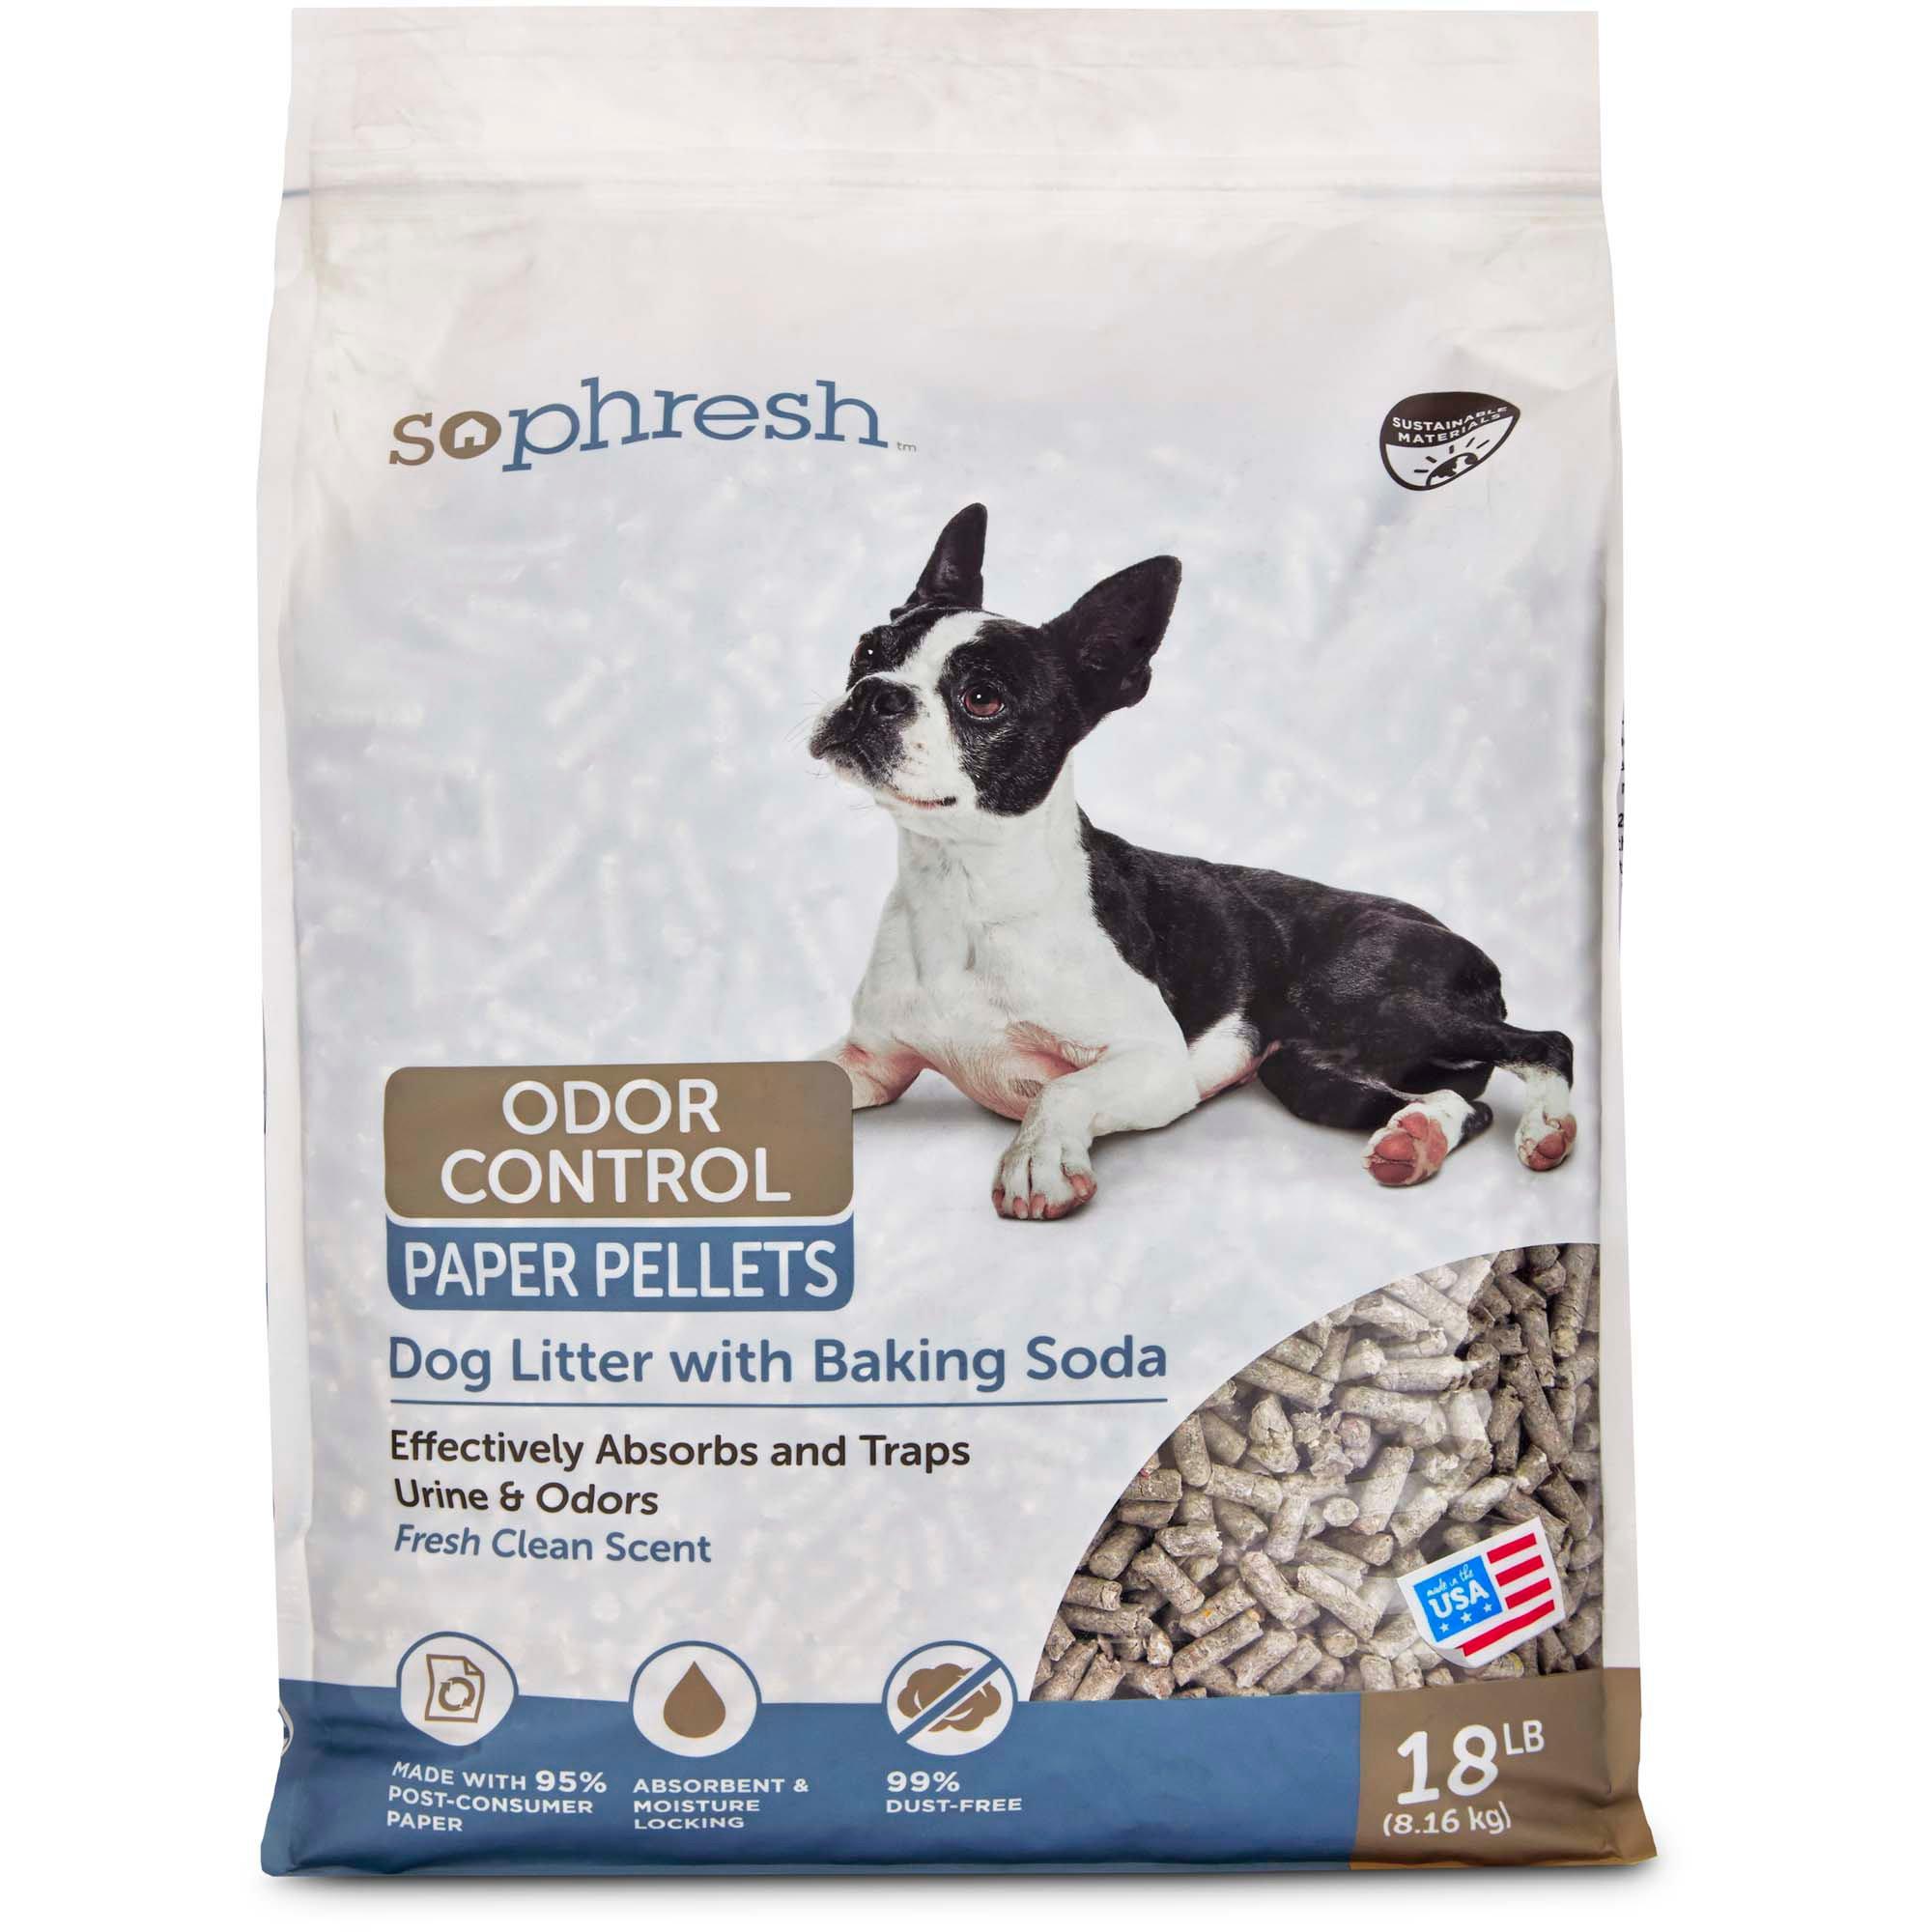 so phresh dog litter with odor control paper petco. Black Bedroom Furniture Sets. Home Design Ideas